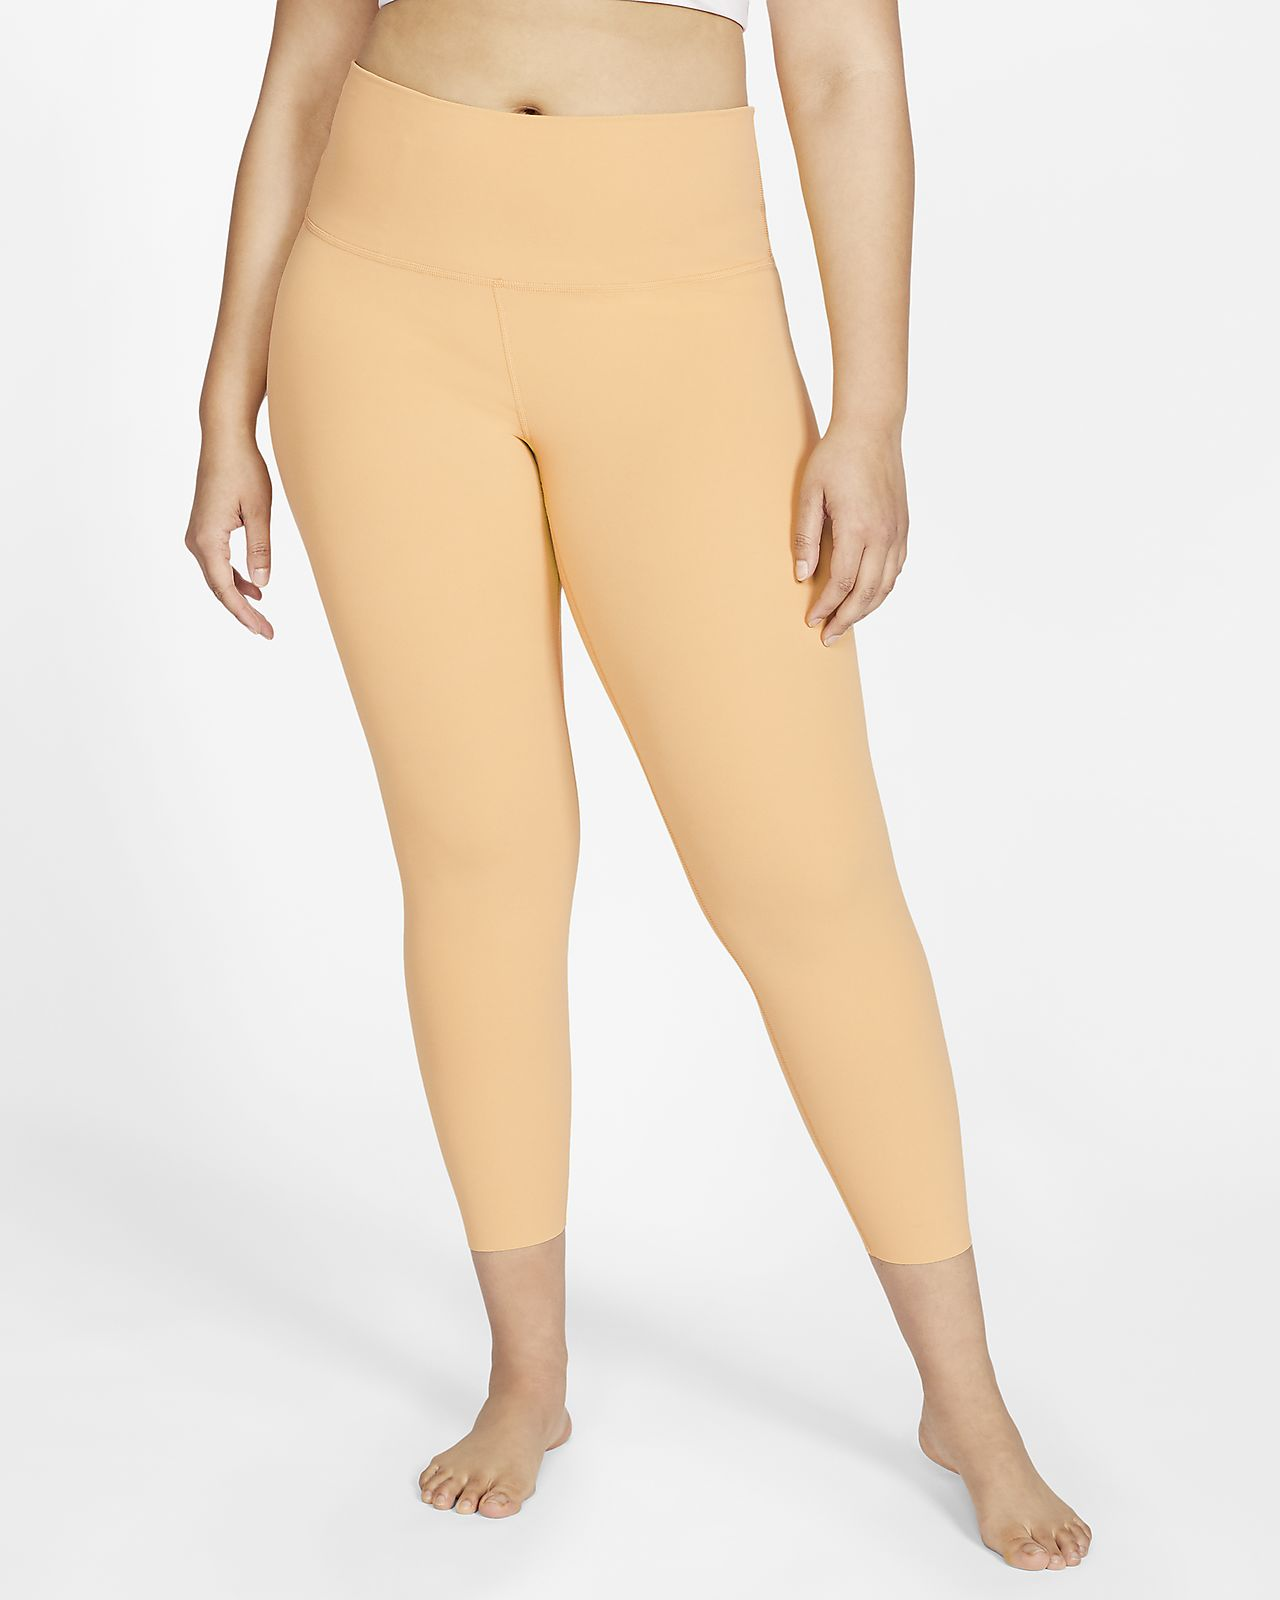 Nike Yoga Luxe Women's Infinalon 7/8 Tights (Plus Size)